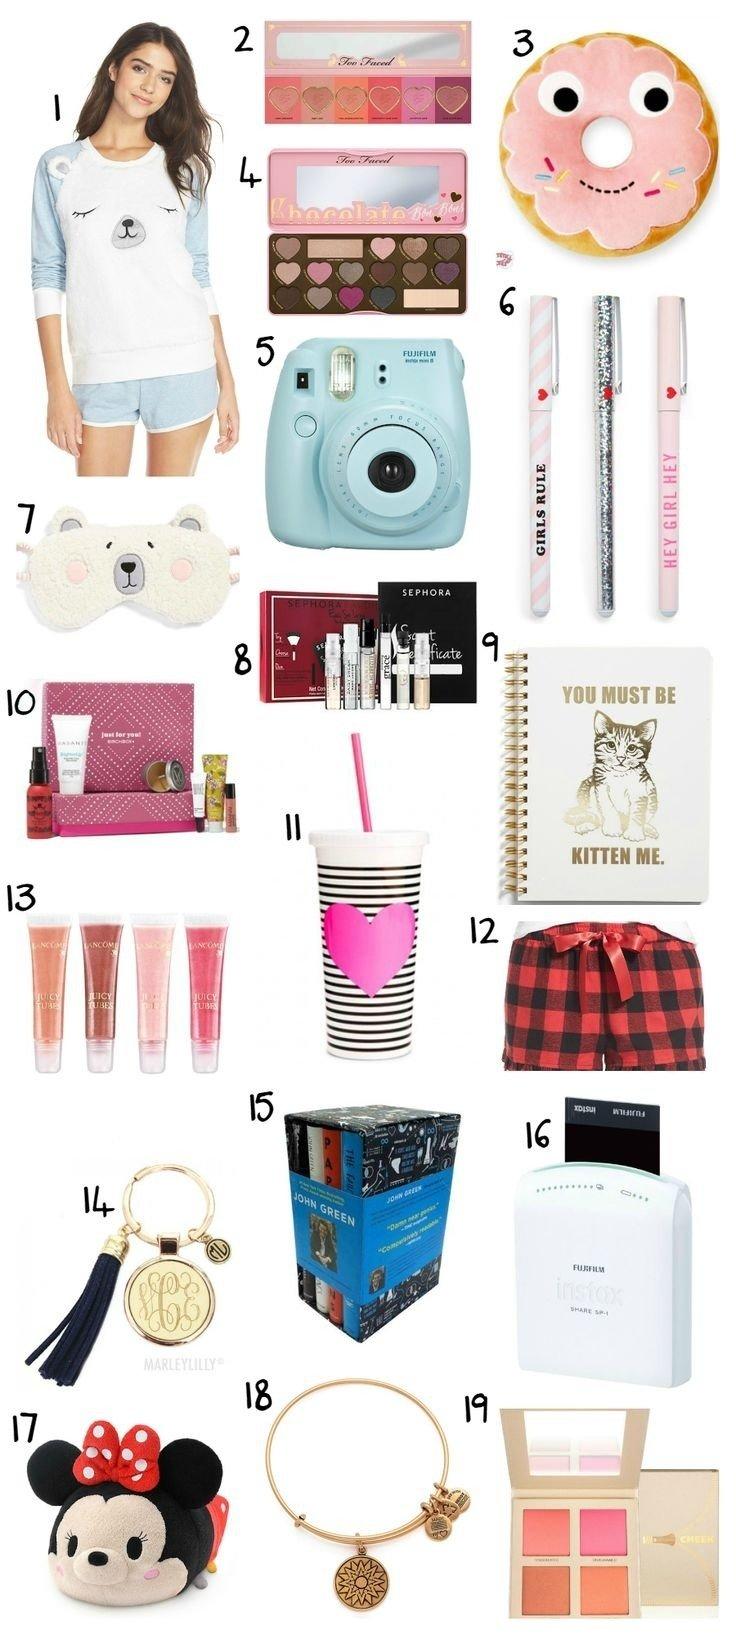 10 Spectacular Birthday Present Ideas For Teenage Girls best 25 birthday present ideas for teens girls ideas on pinterest 2021